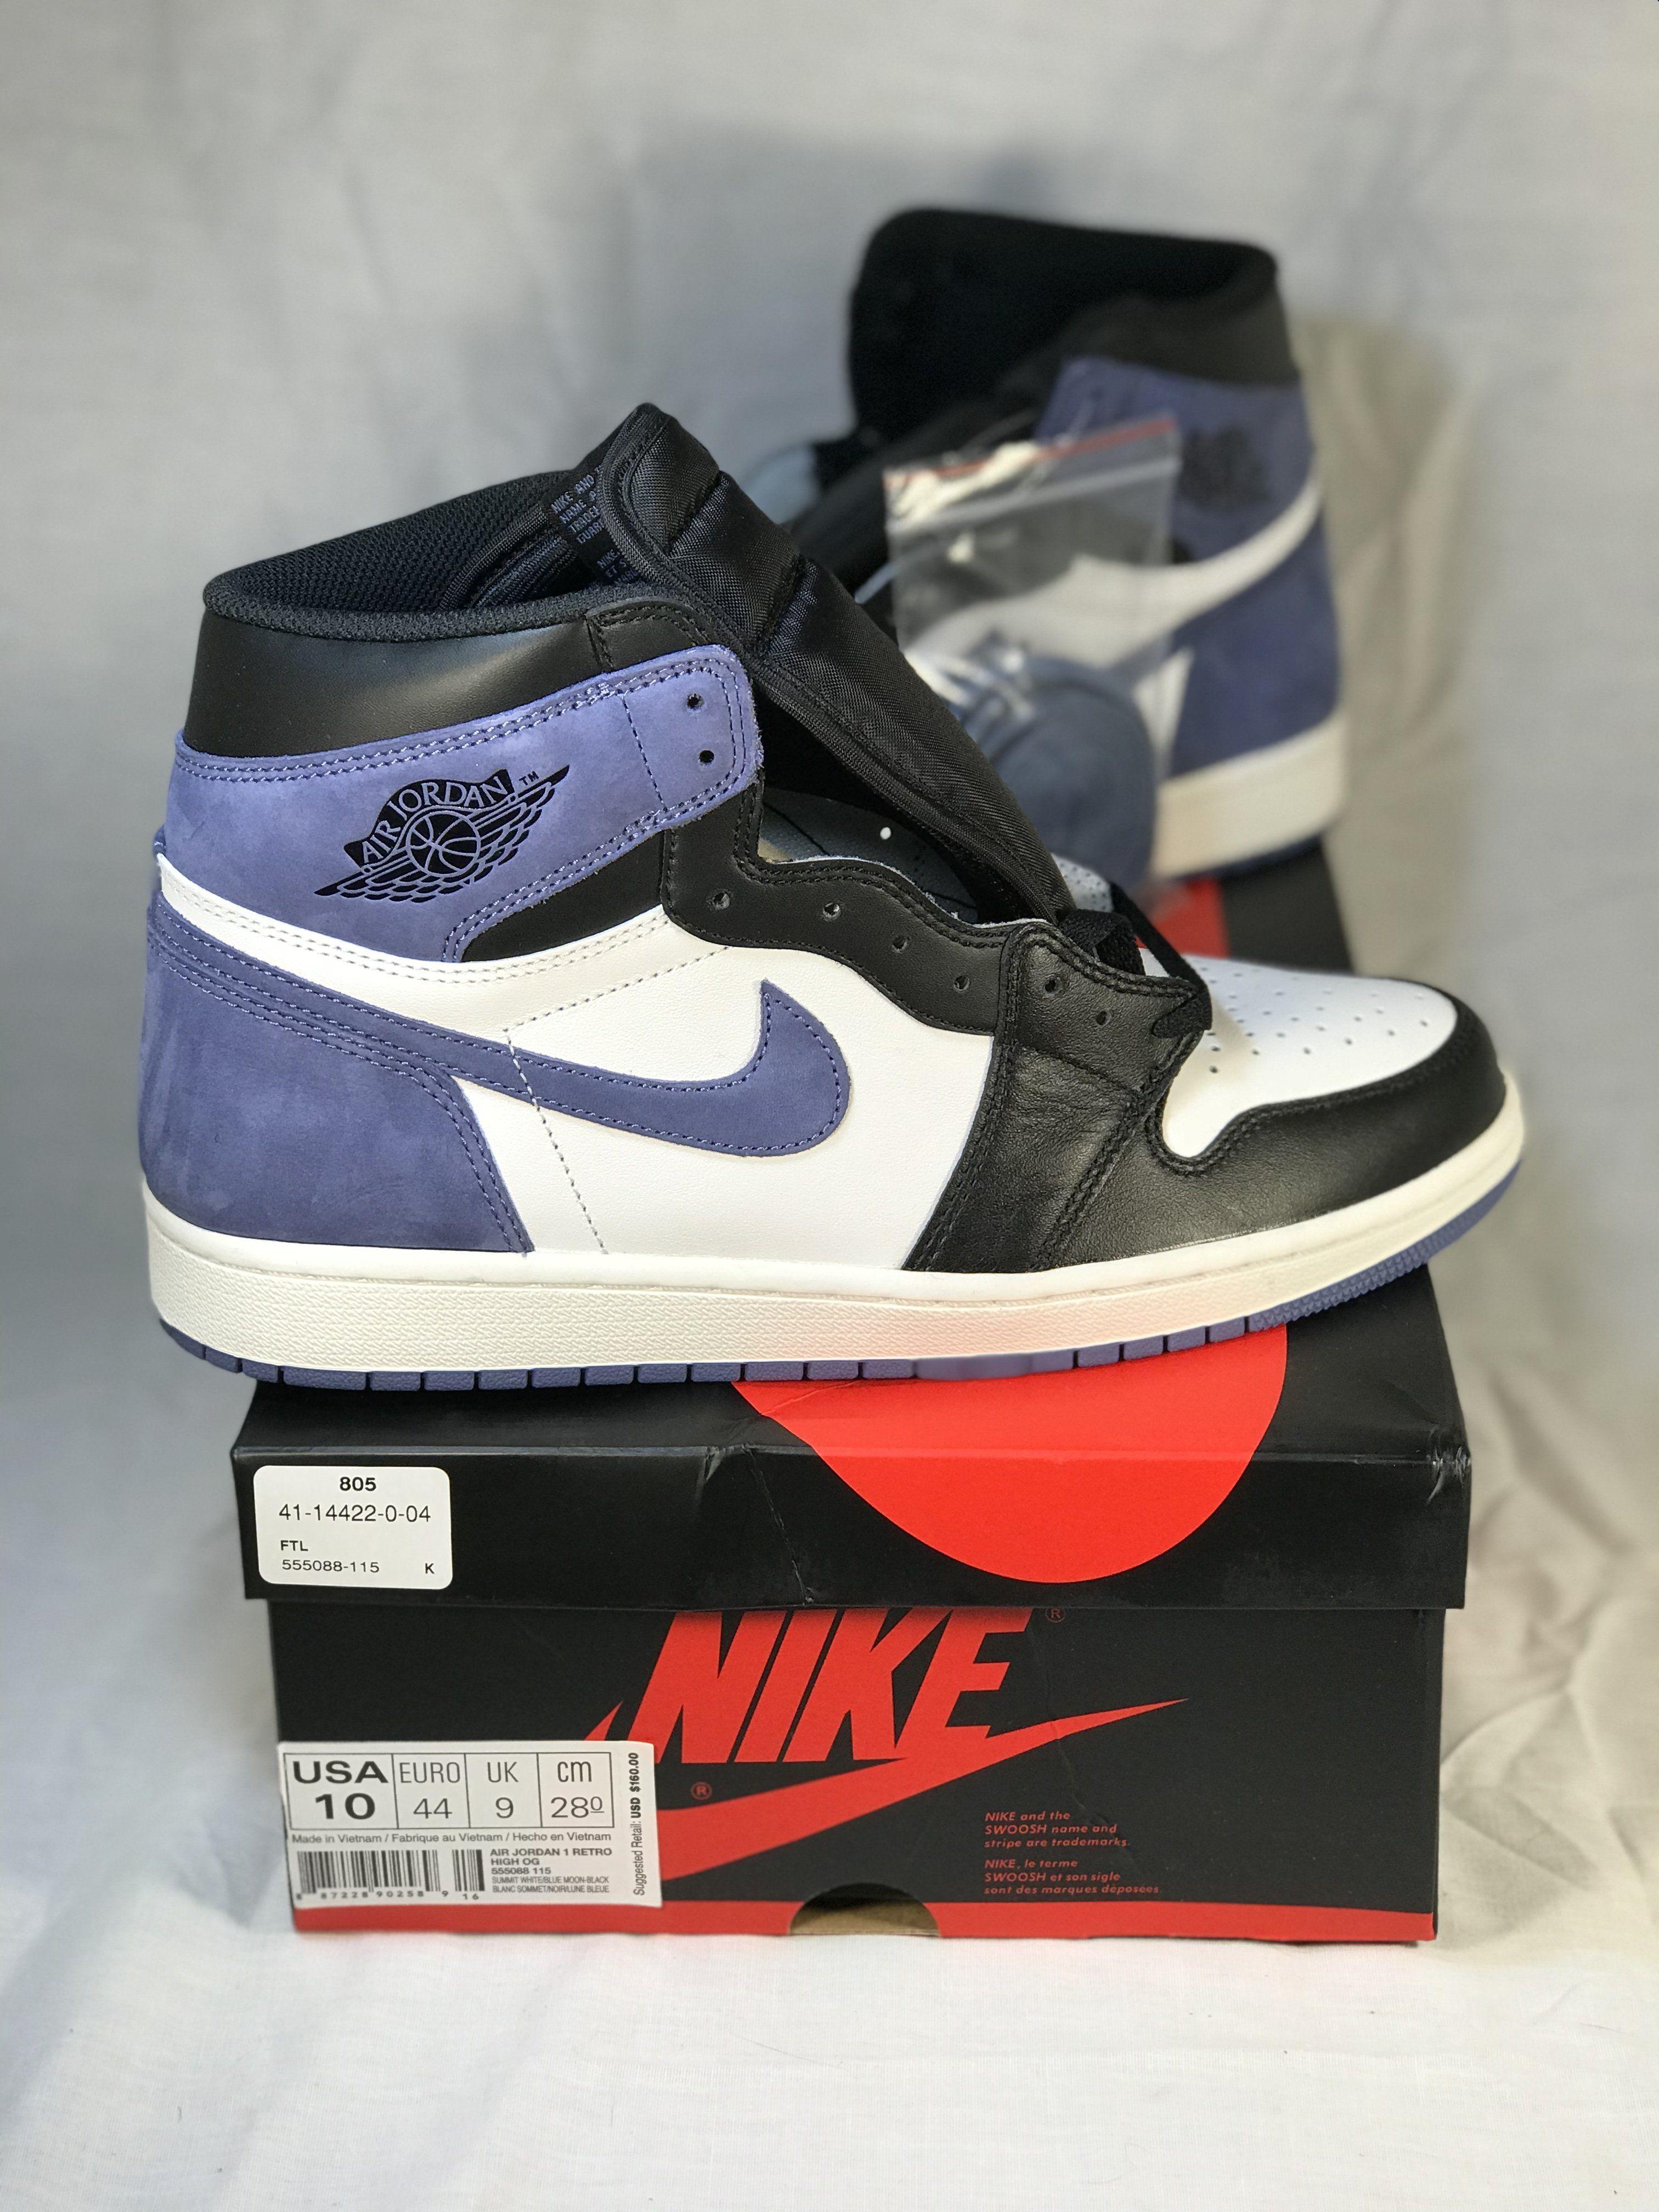 Air Jordan 1 Retro High Og Blue Moon Jordan 1 Retro High Air